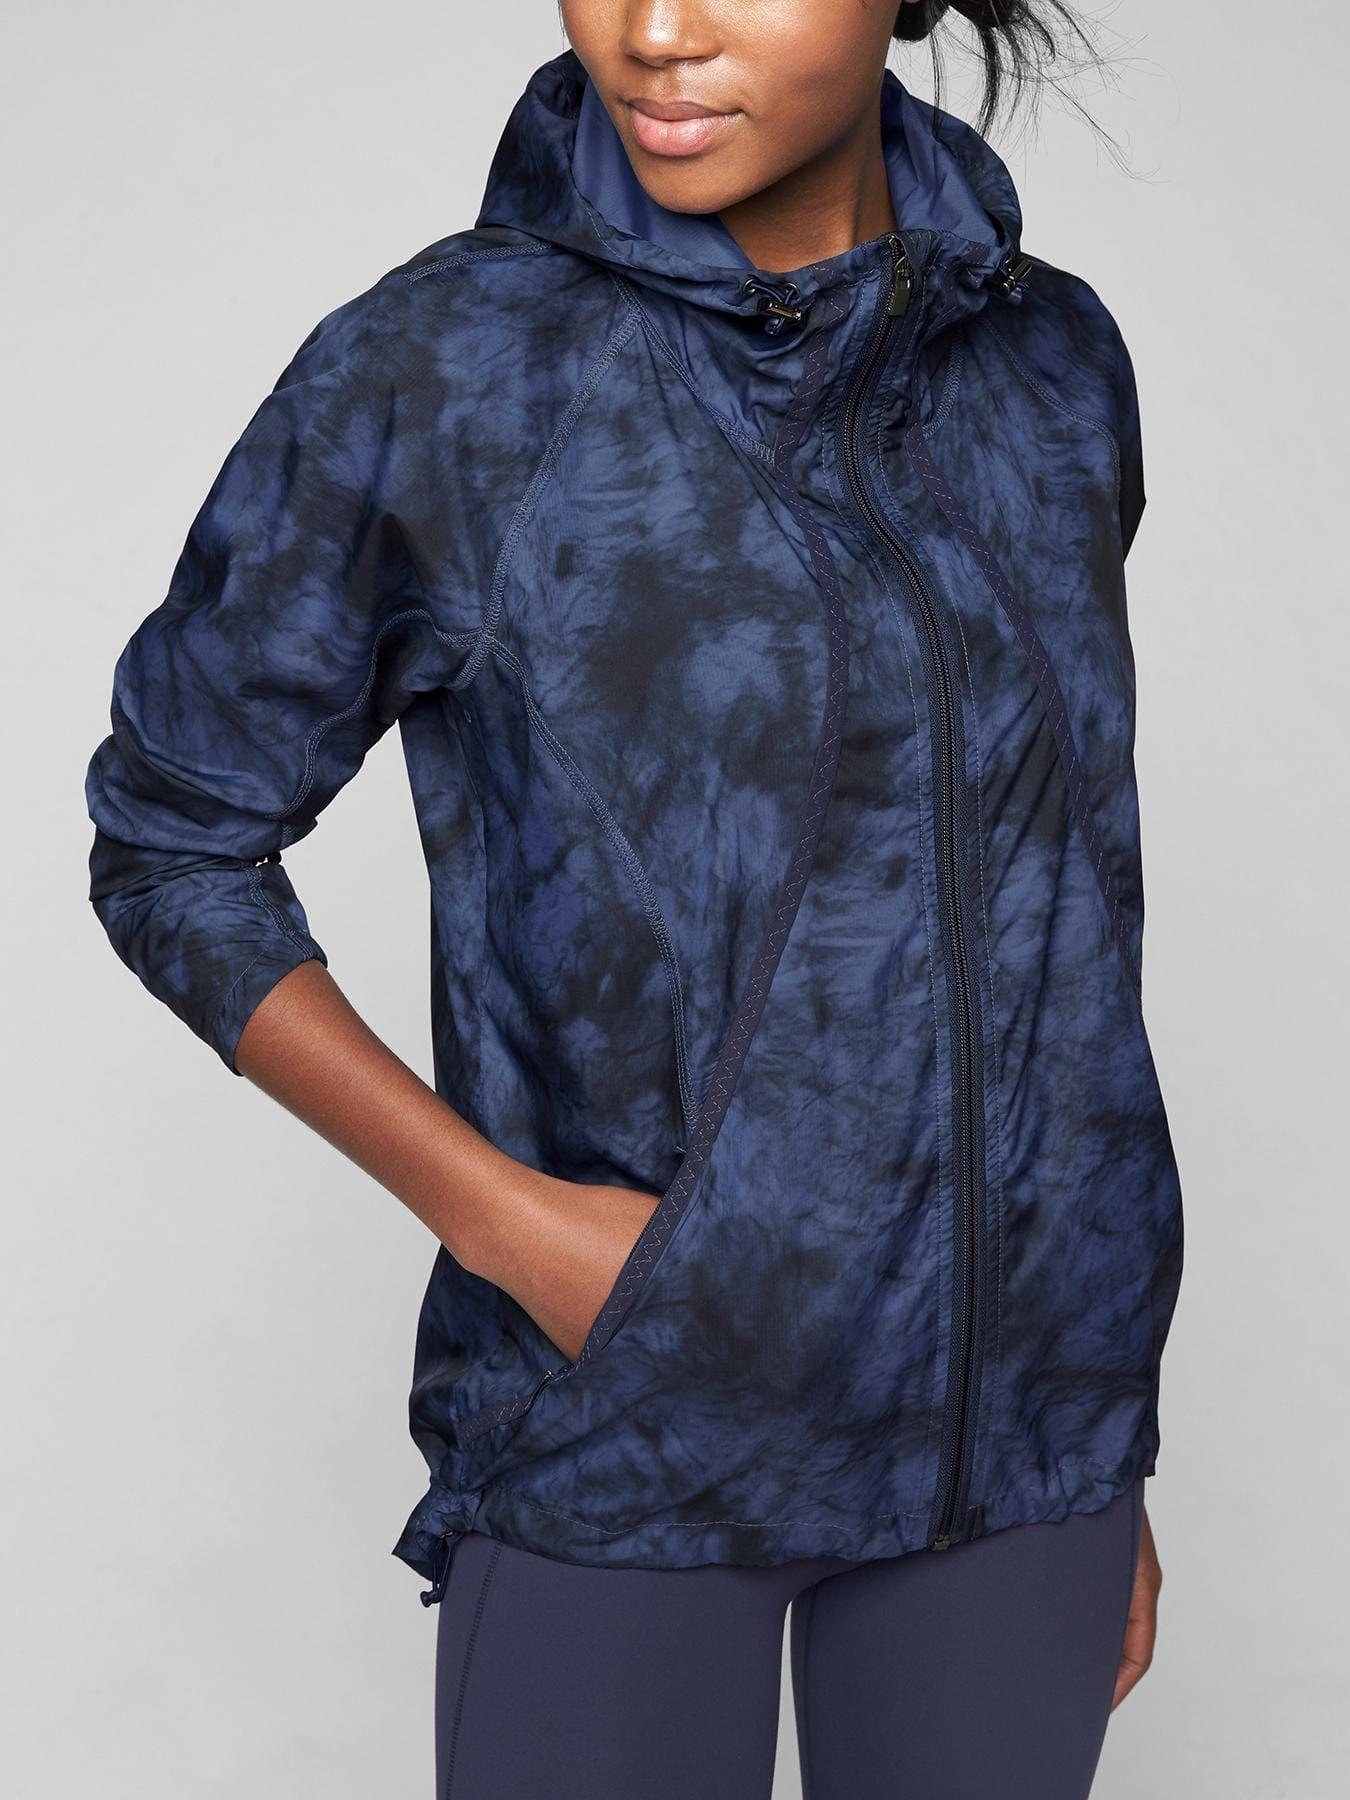 Tie Dye Catalina Upf Jacket Athleta Clothes Design Activewear Jackets Women Tie [ 1800 x 1350 Pixel ]